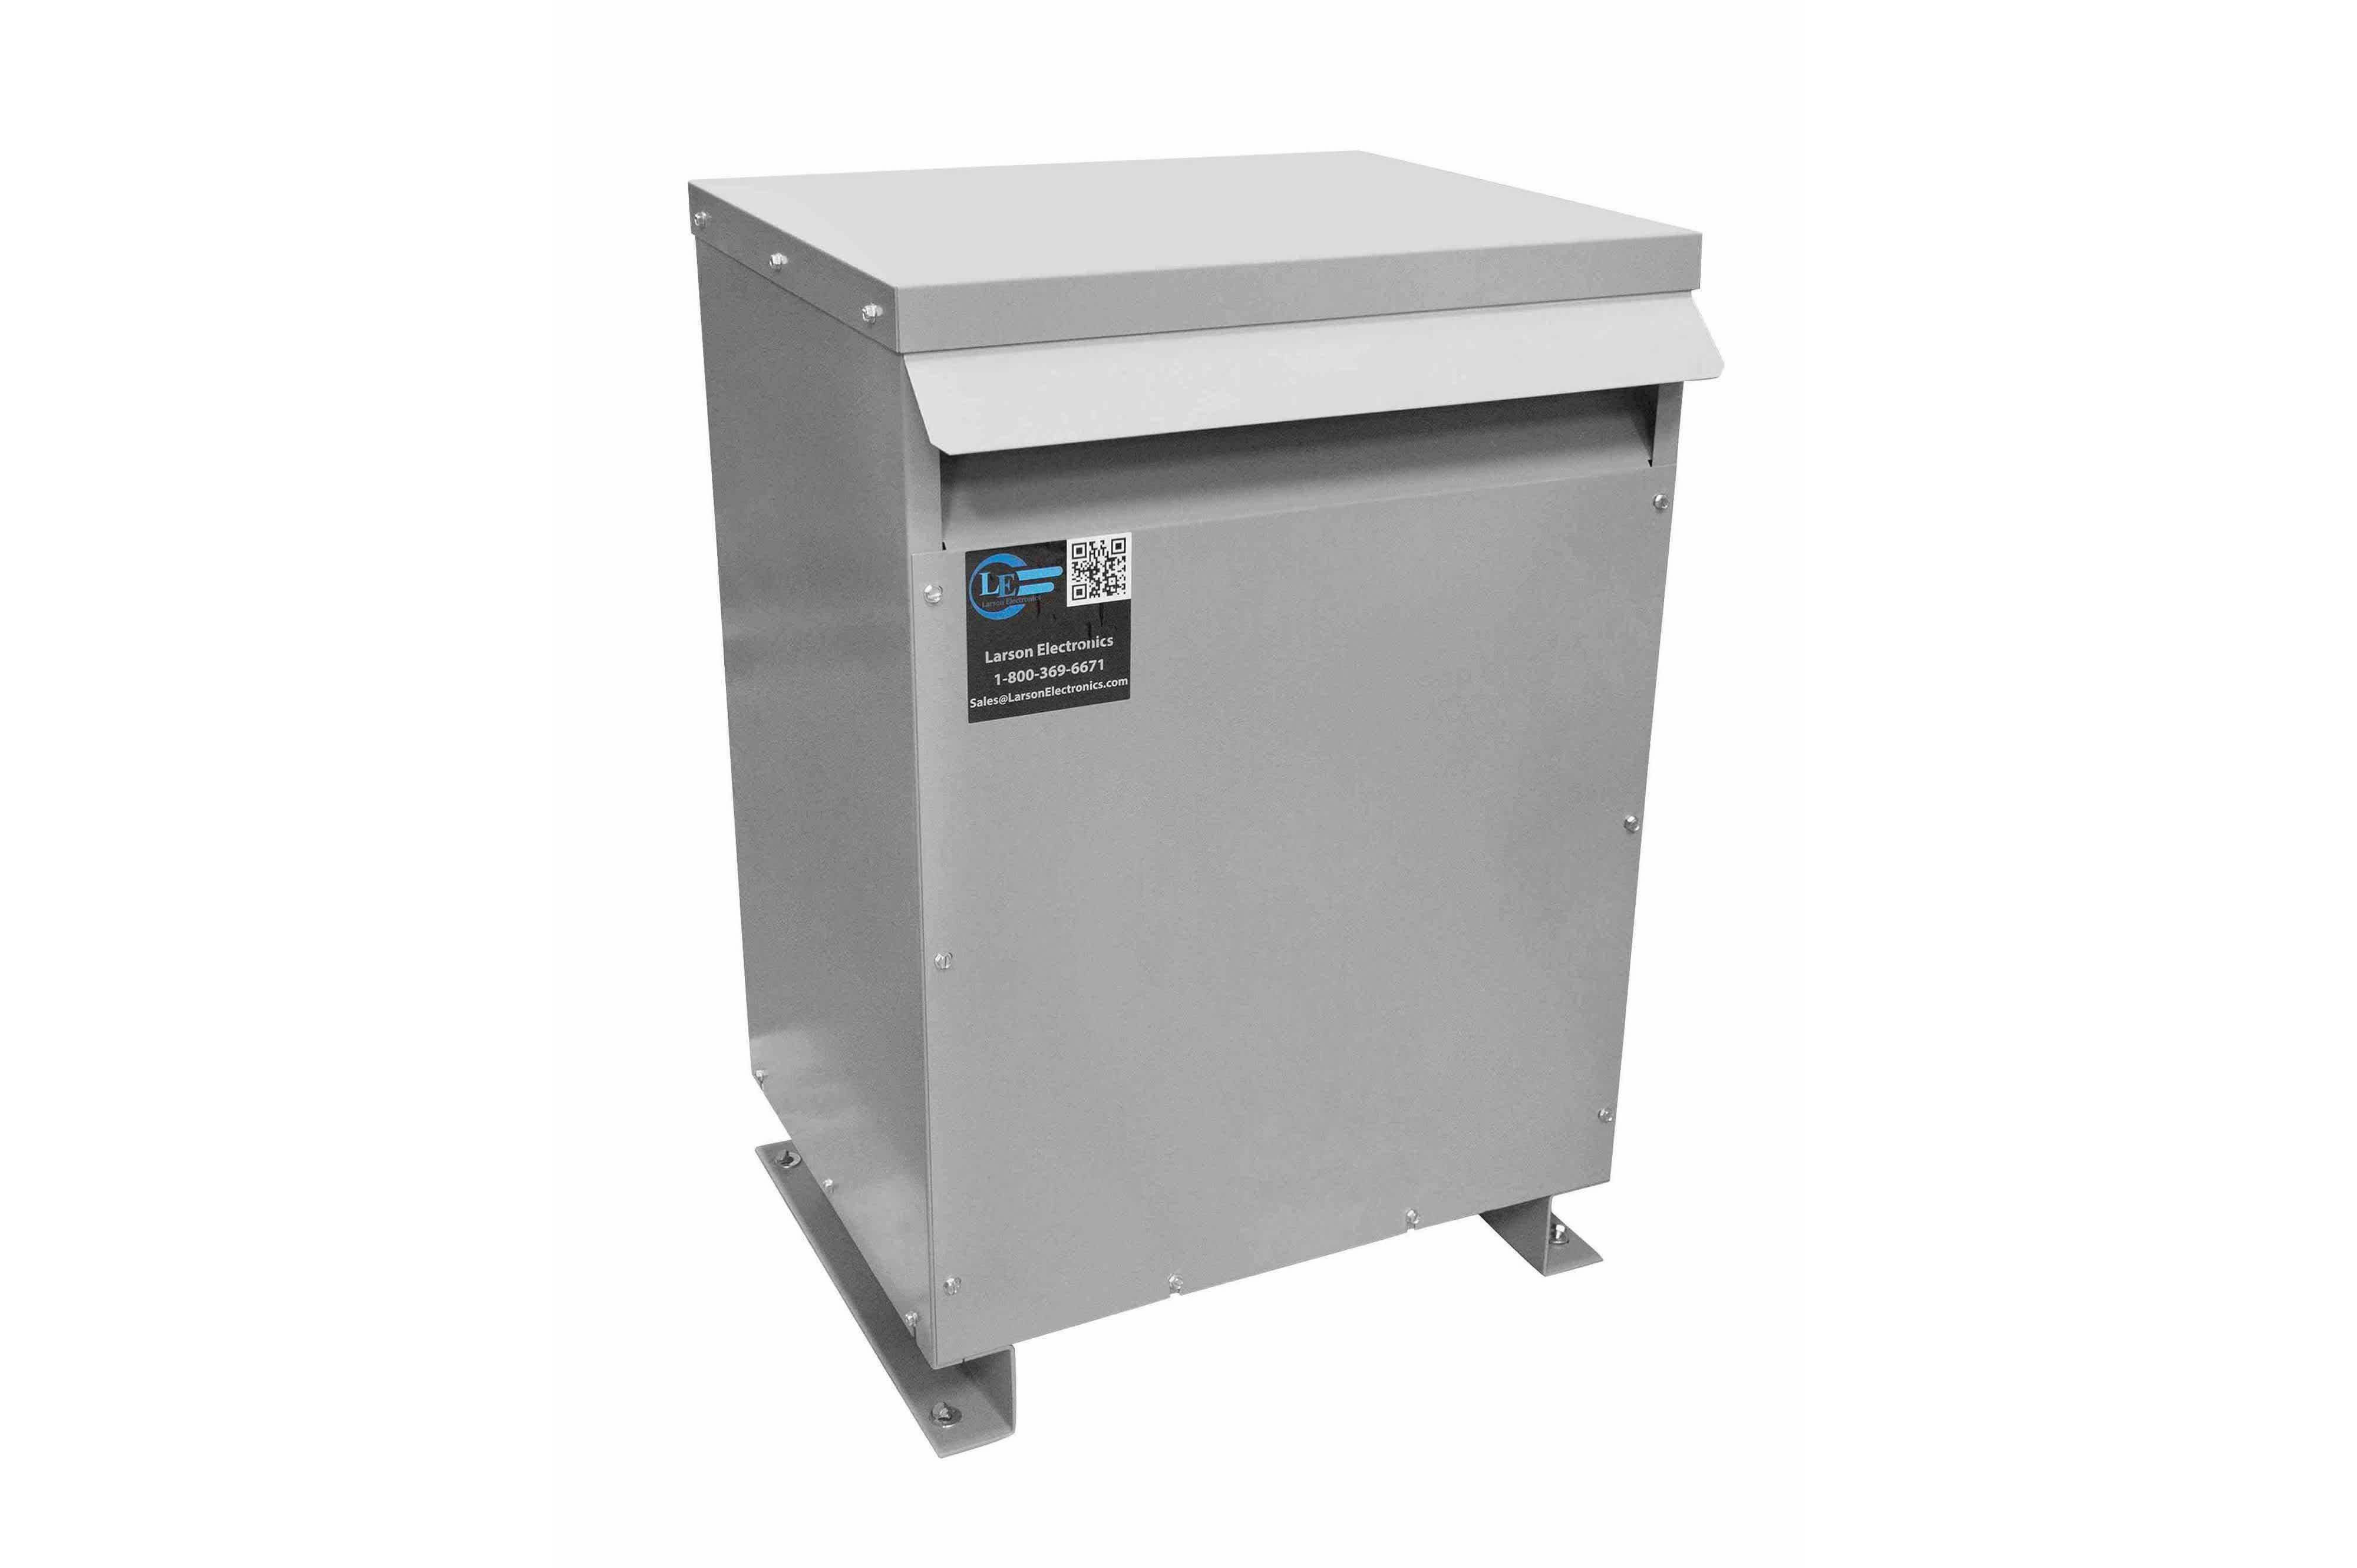 100 kVA 3PH Isolation Transformer, 480V Wye Primary, 240V Delta Secondary, N3R, Ventilated, 60 Hz